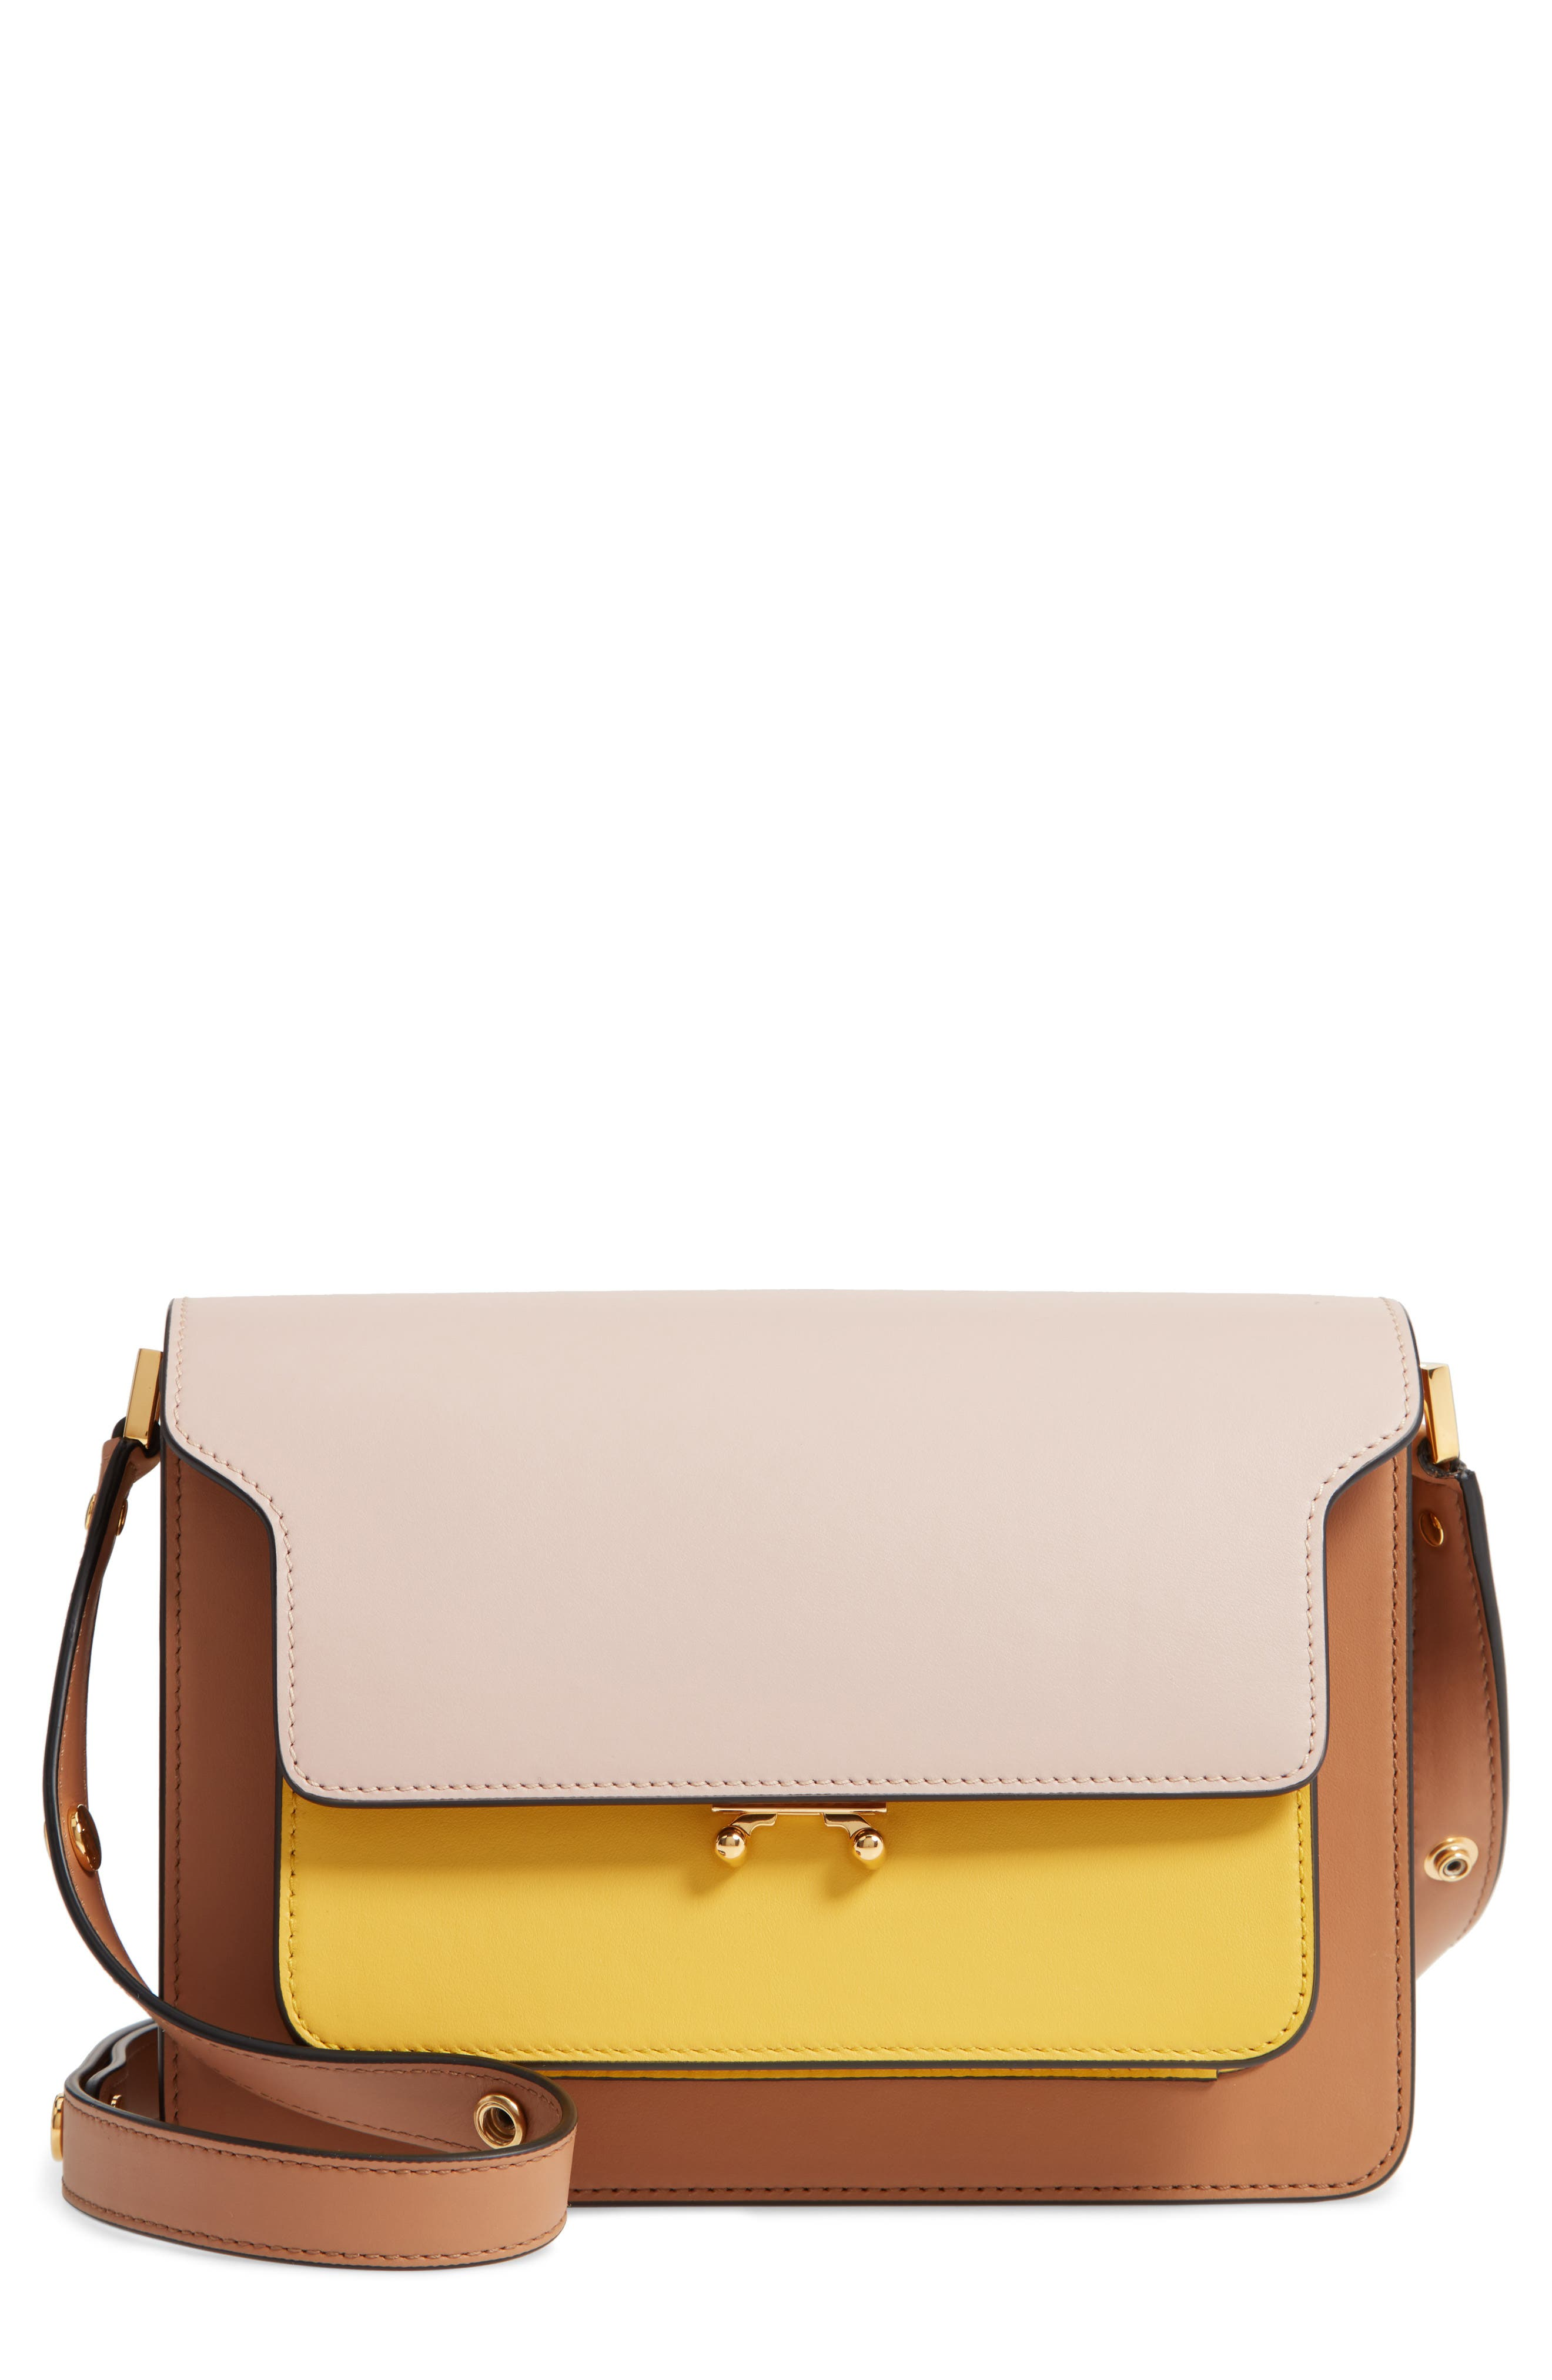 MARNI Trunk Colorblock Leather Shoulder Bag, Main, color, QUARTZ/ SUNO/ POMPEII